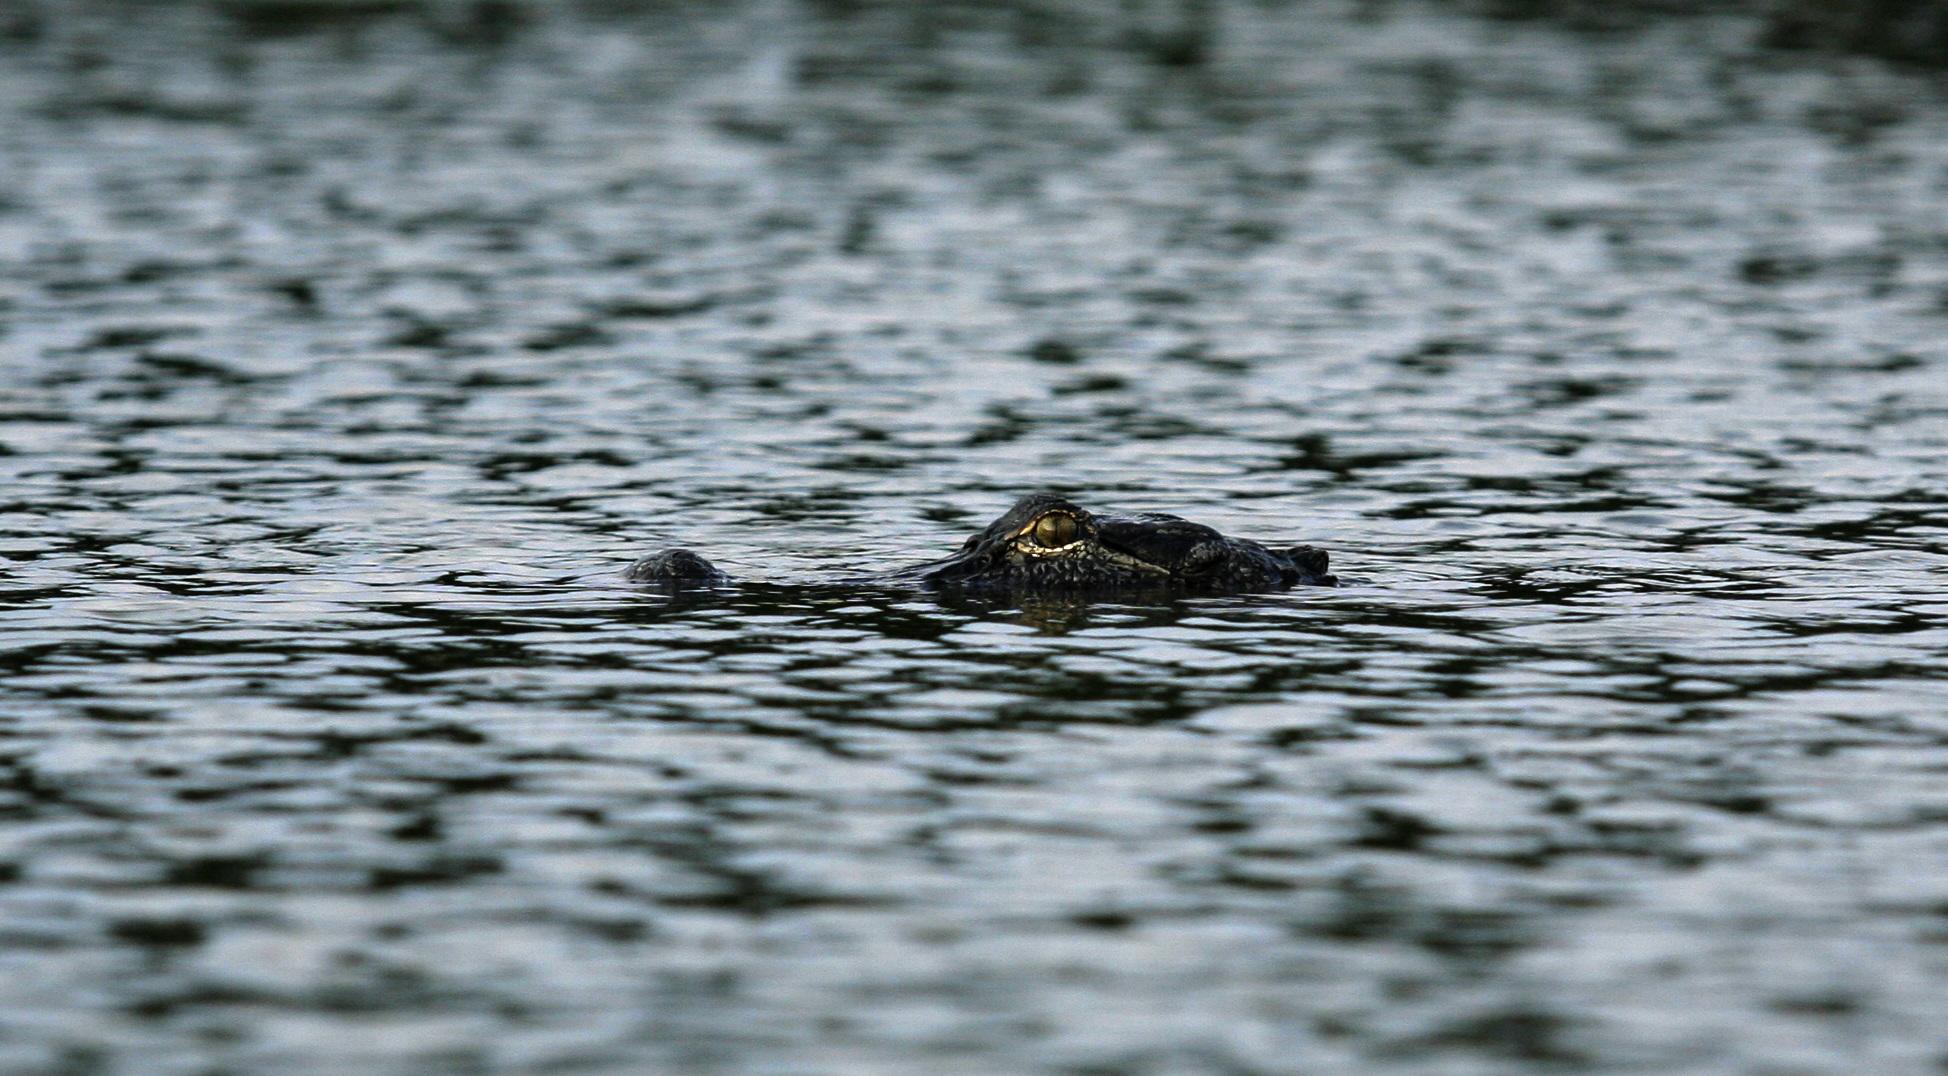 An alligator surfaces at Lake Martin on Saturday, Aug. 16, 2010, near Breaux Bridge, La. (Kevin Martin)